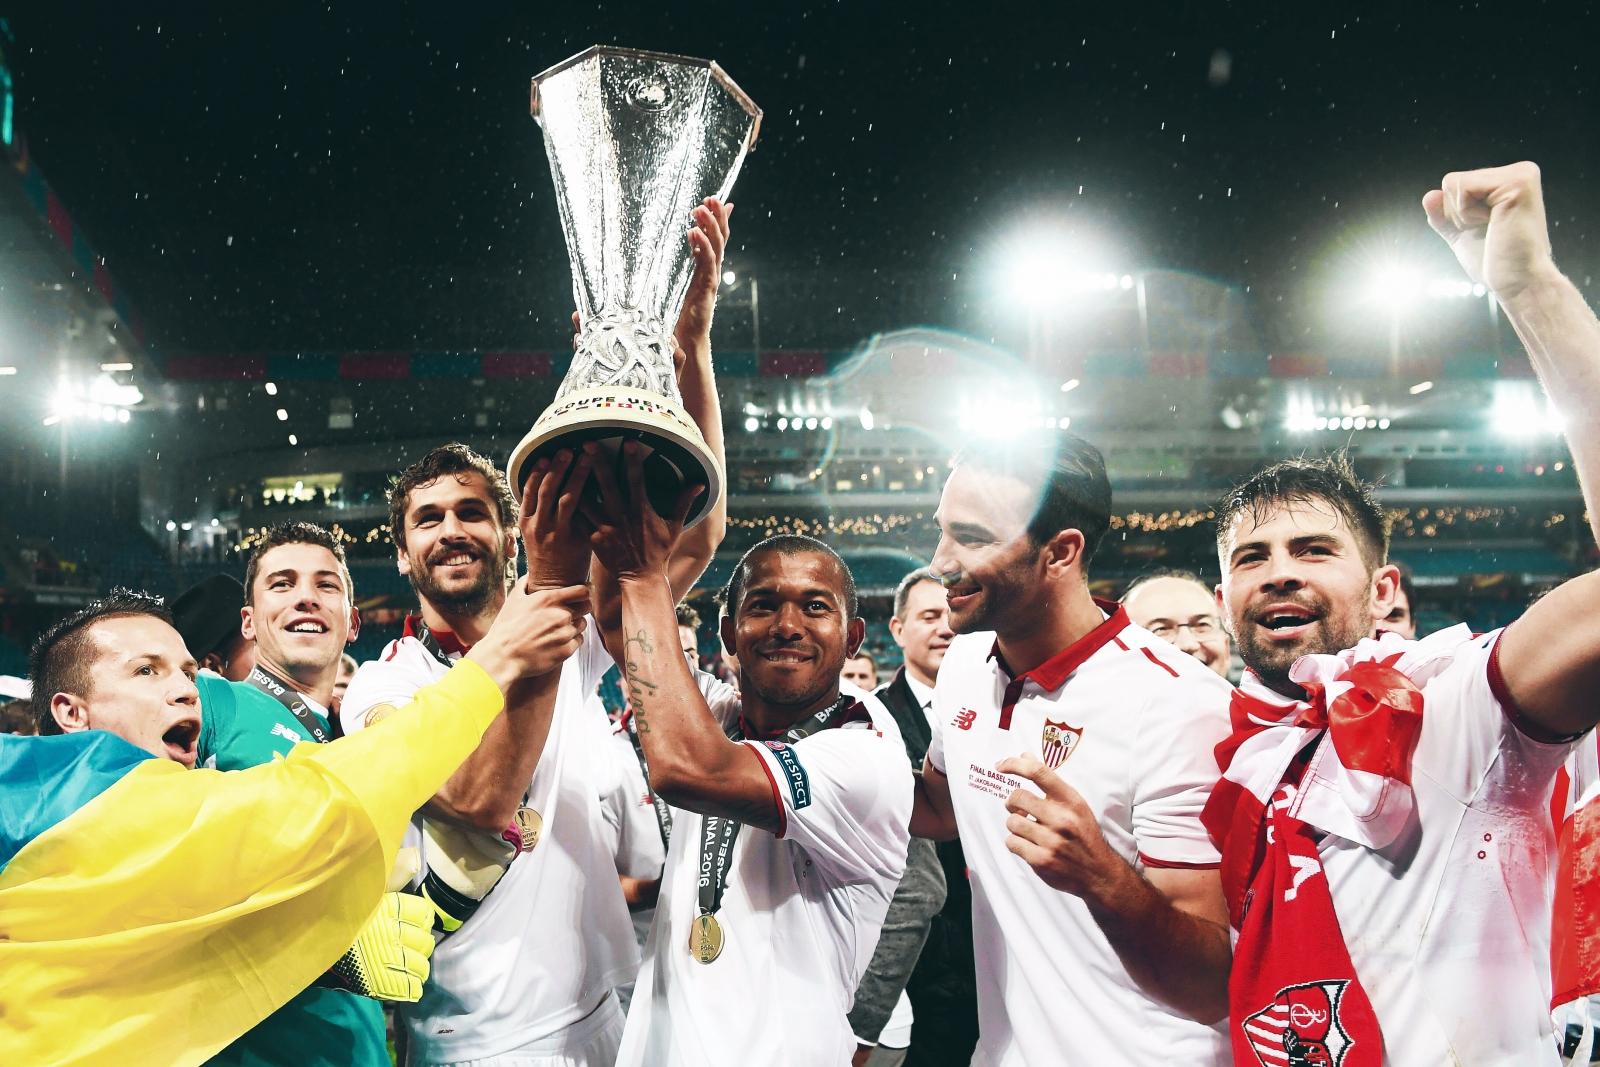 History of the Sevilla Futbol Club